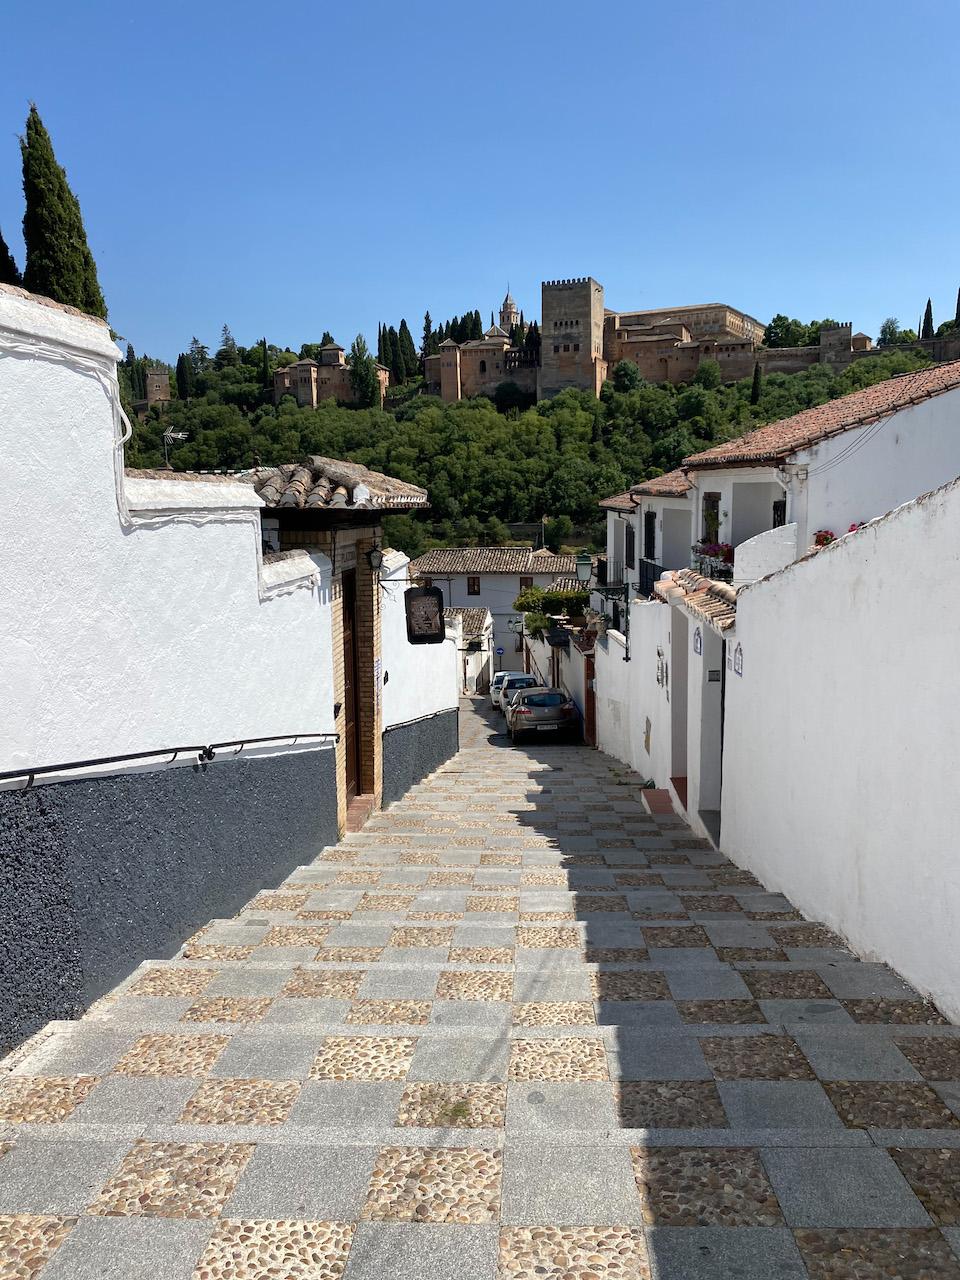 Stedentrip Granda - wijk Albaicin